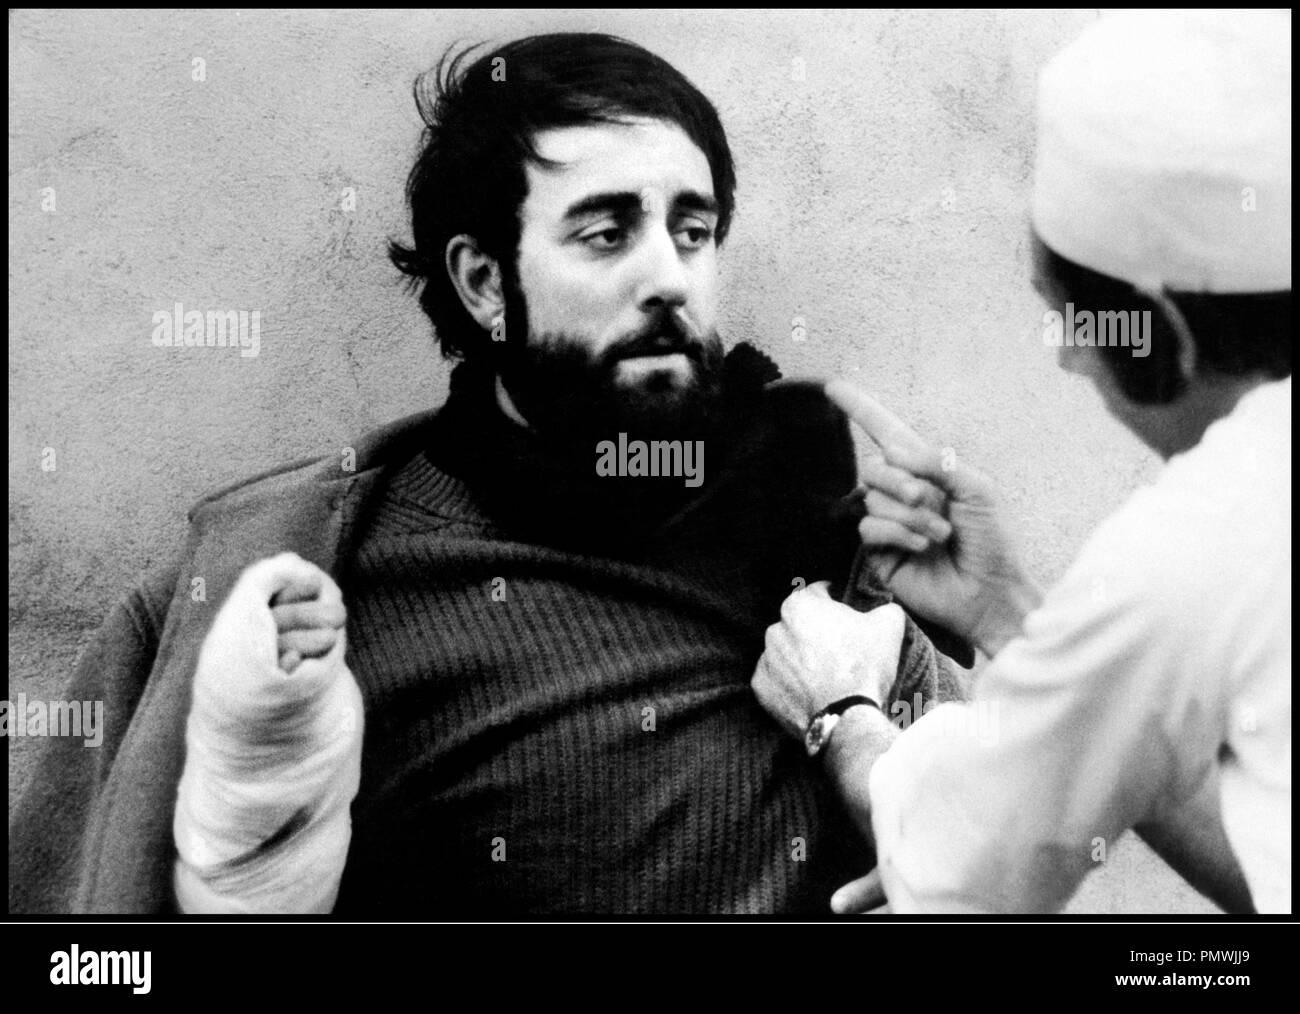 Prod DB © SRG / DR CHARLES, MORT OU VIF de Alain Tanner 1969 SUI. avec Marcel Robert platre, infirmier, menacer - Stock Image